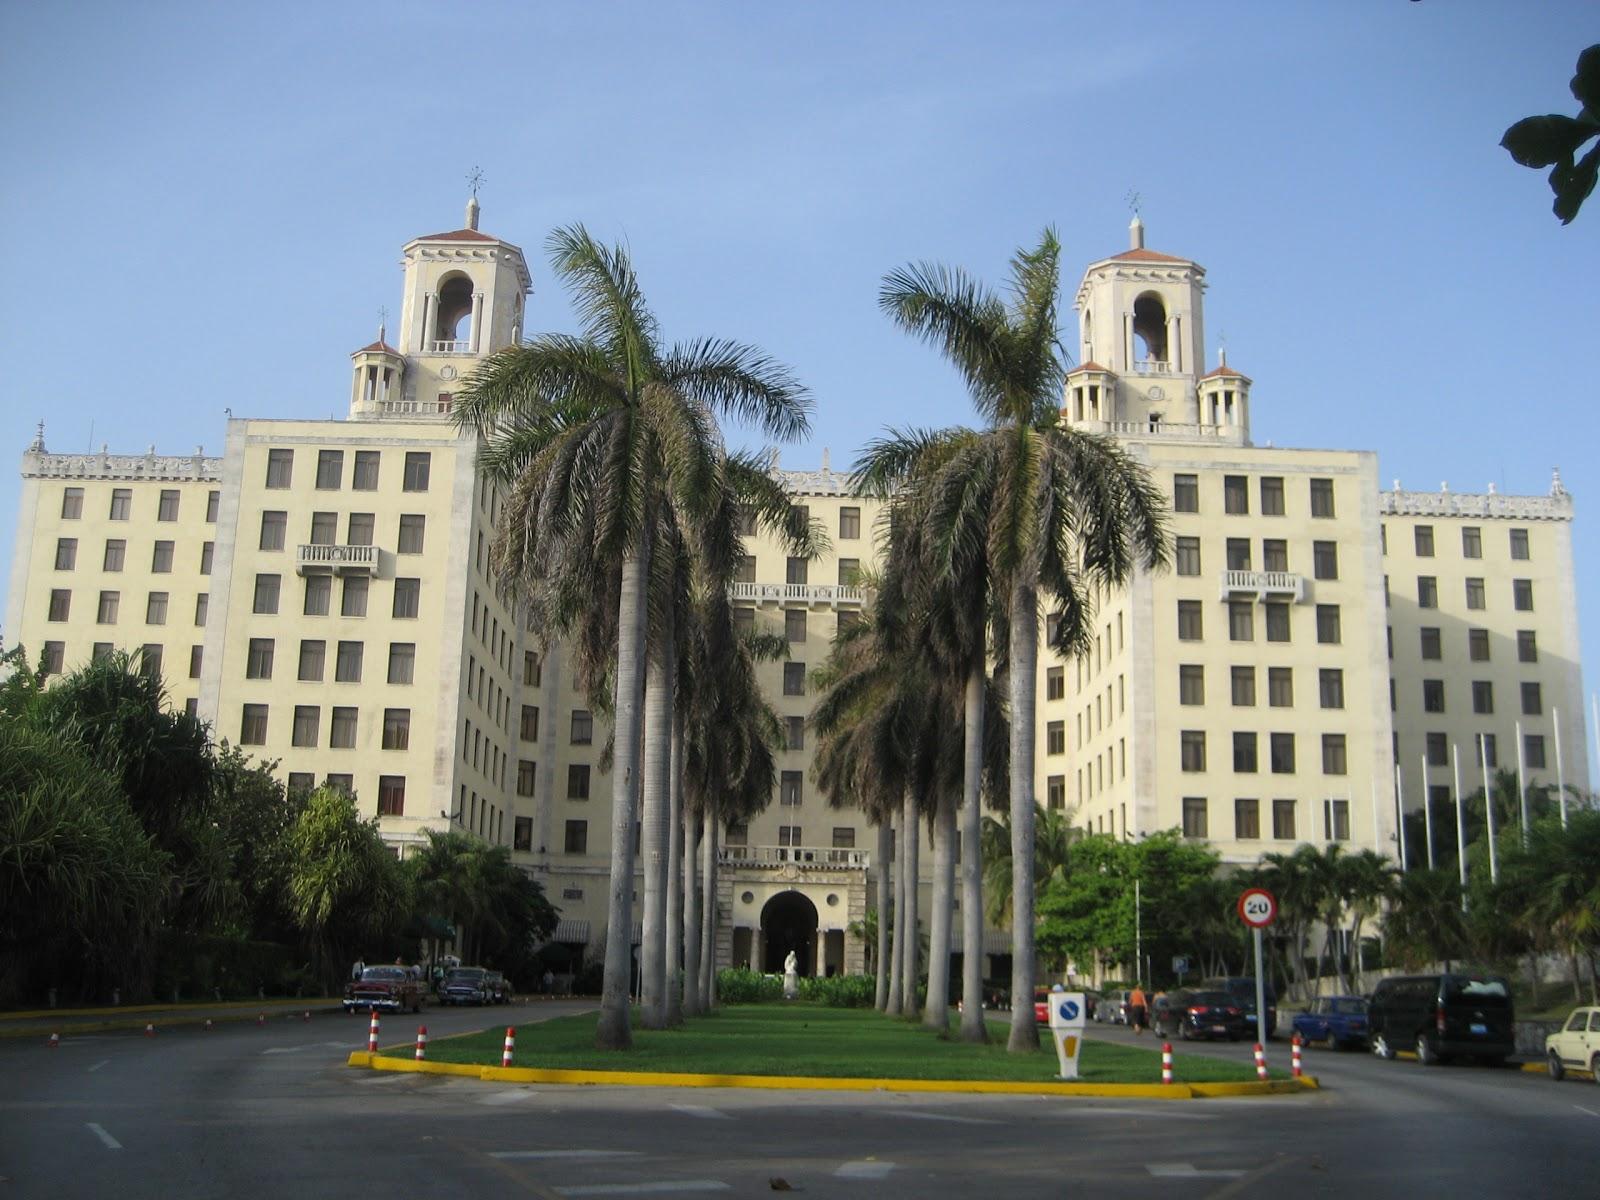 Nacional: HOTEL NACIONAL DE CUBA